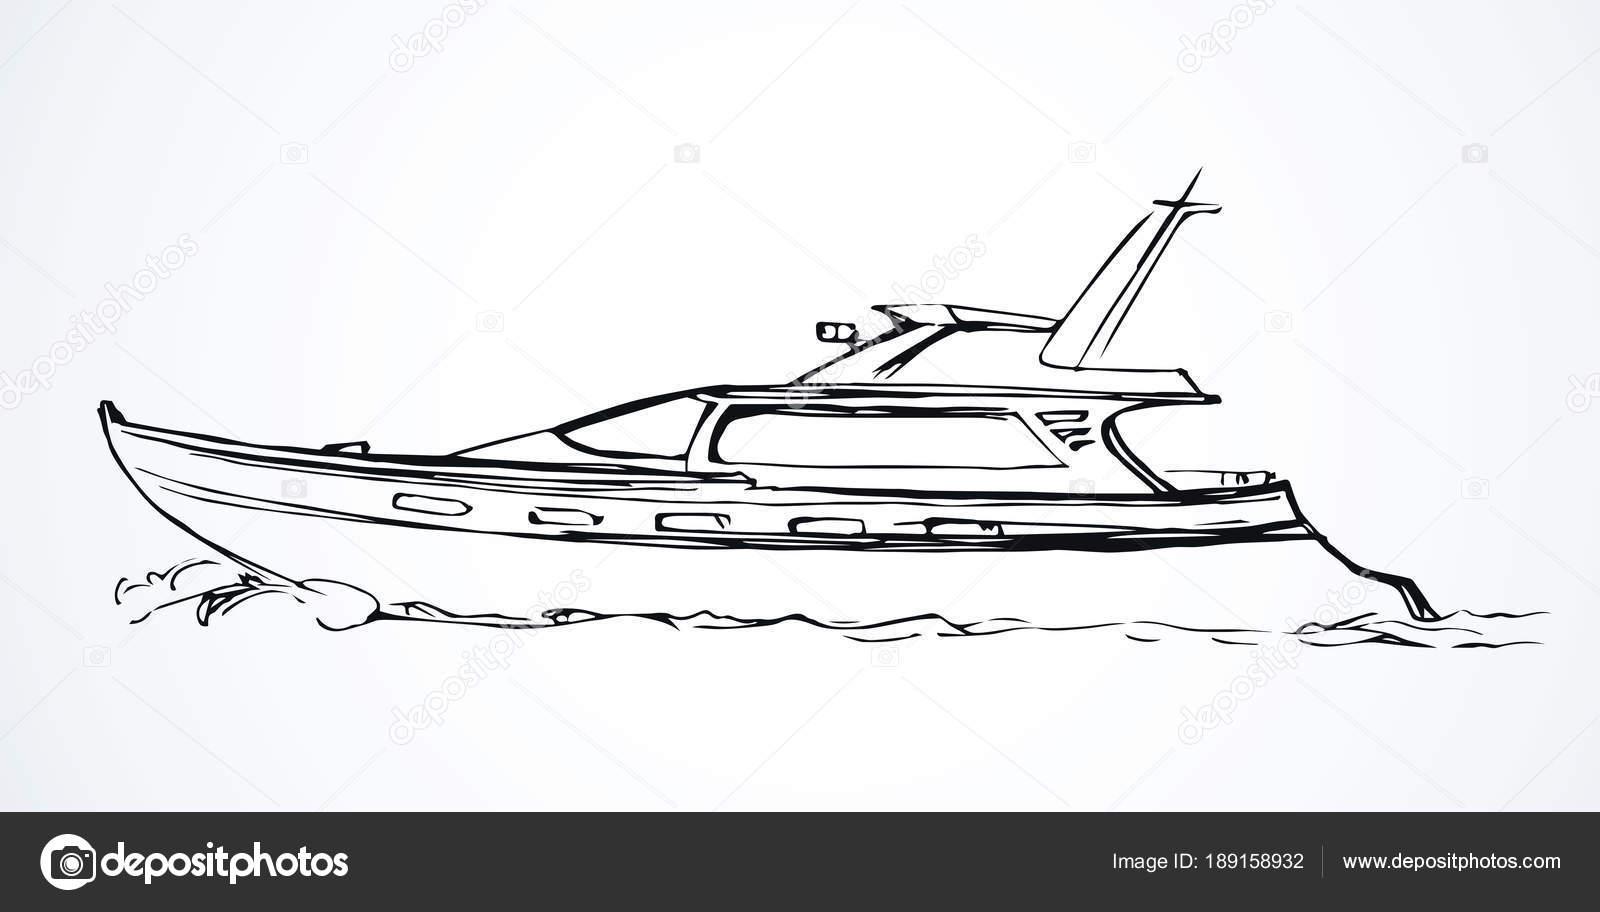 yacht  dessin vectoriel  u2014 image vectorielle marinka  u00a9  189158932